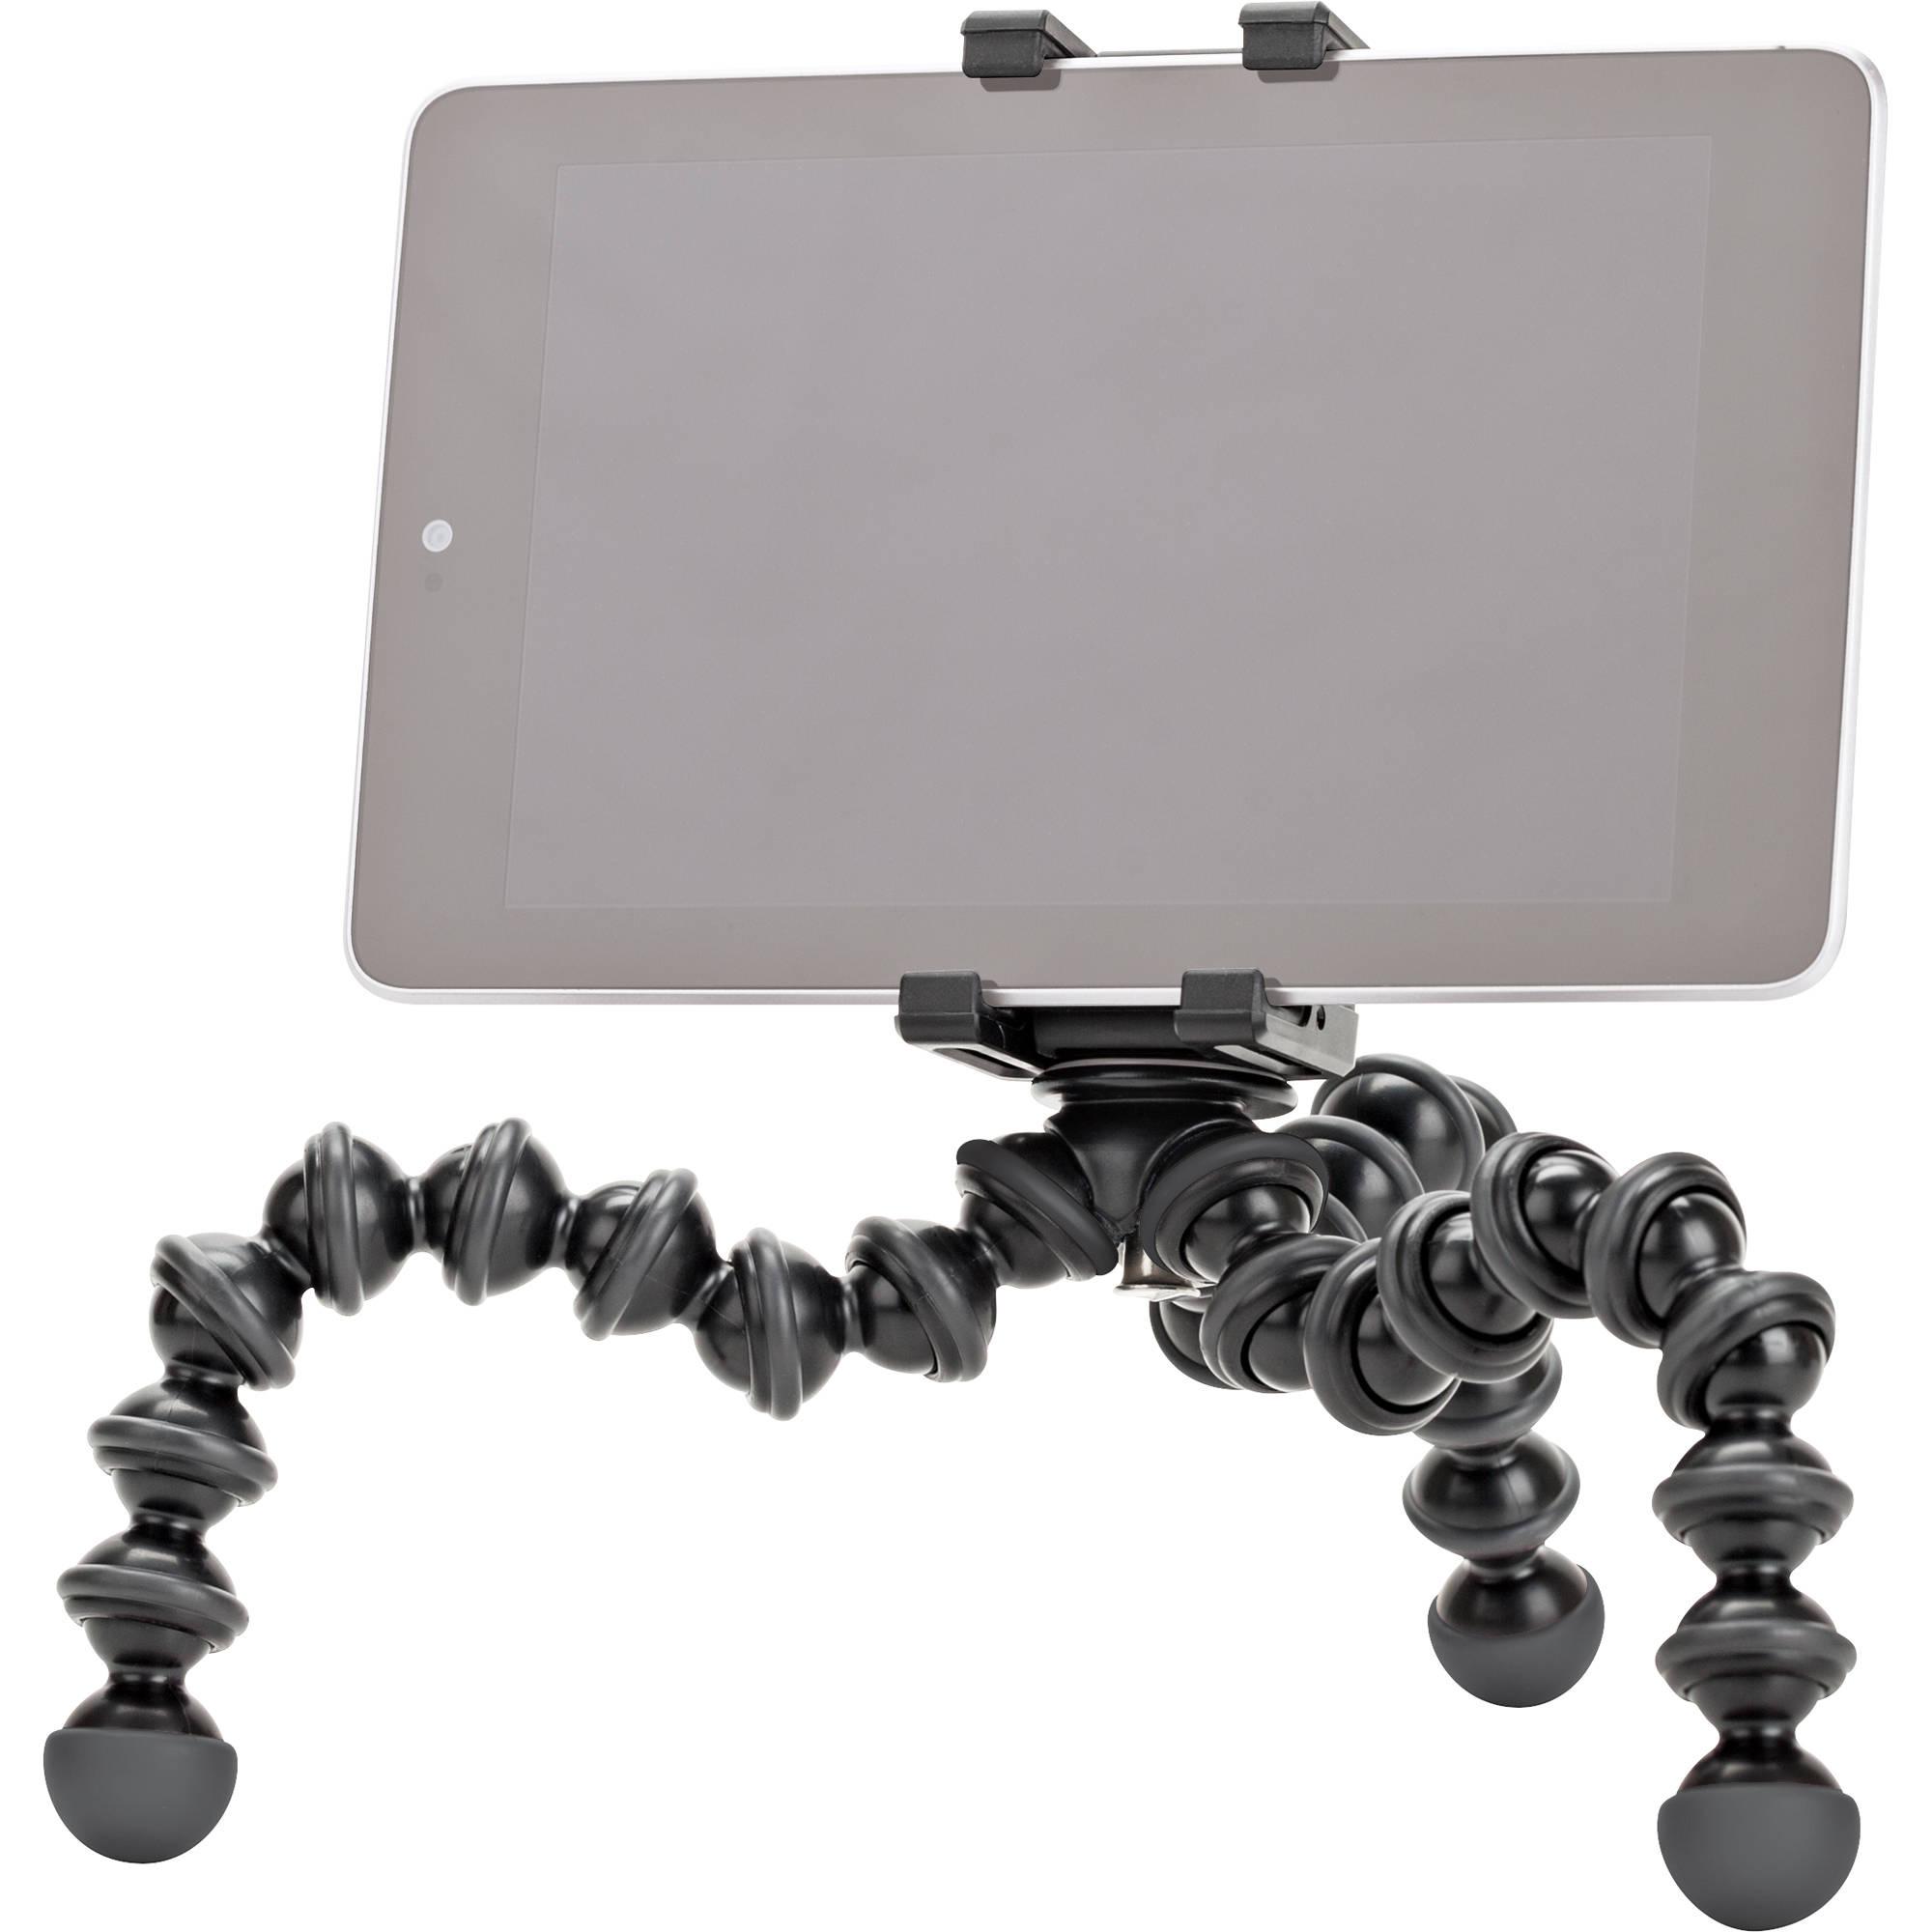 Joby GripTight GorillaPod Stand for Smaller Tablets